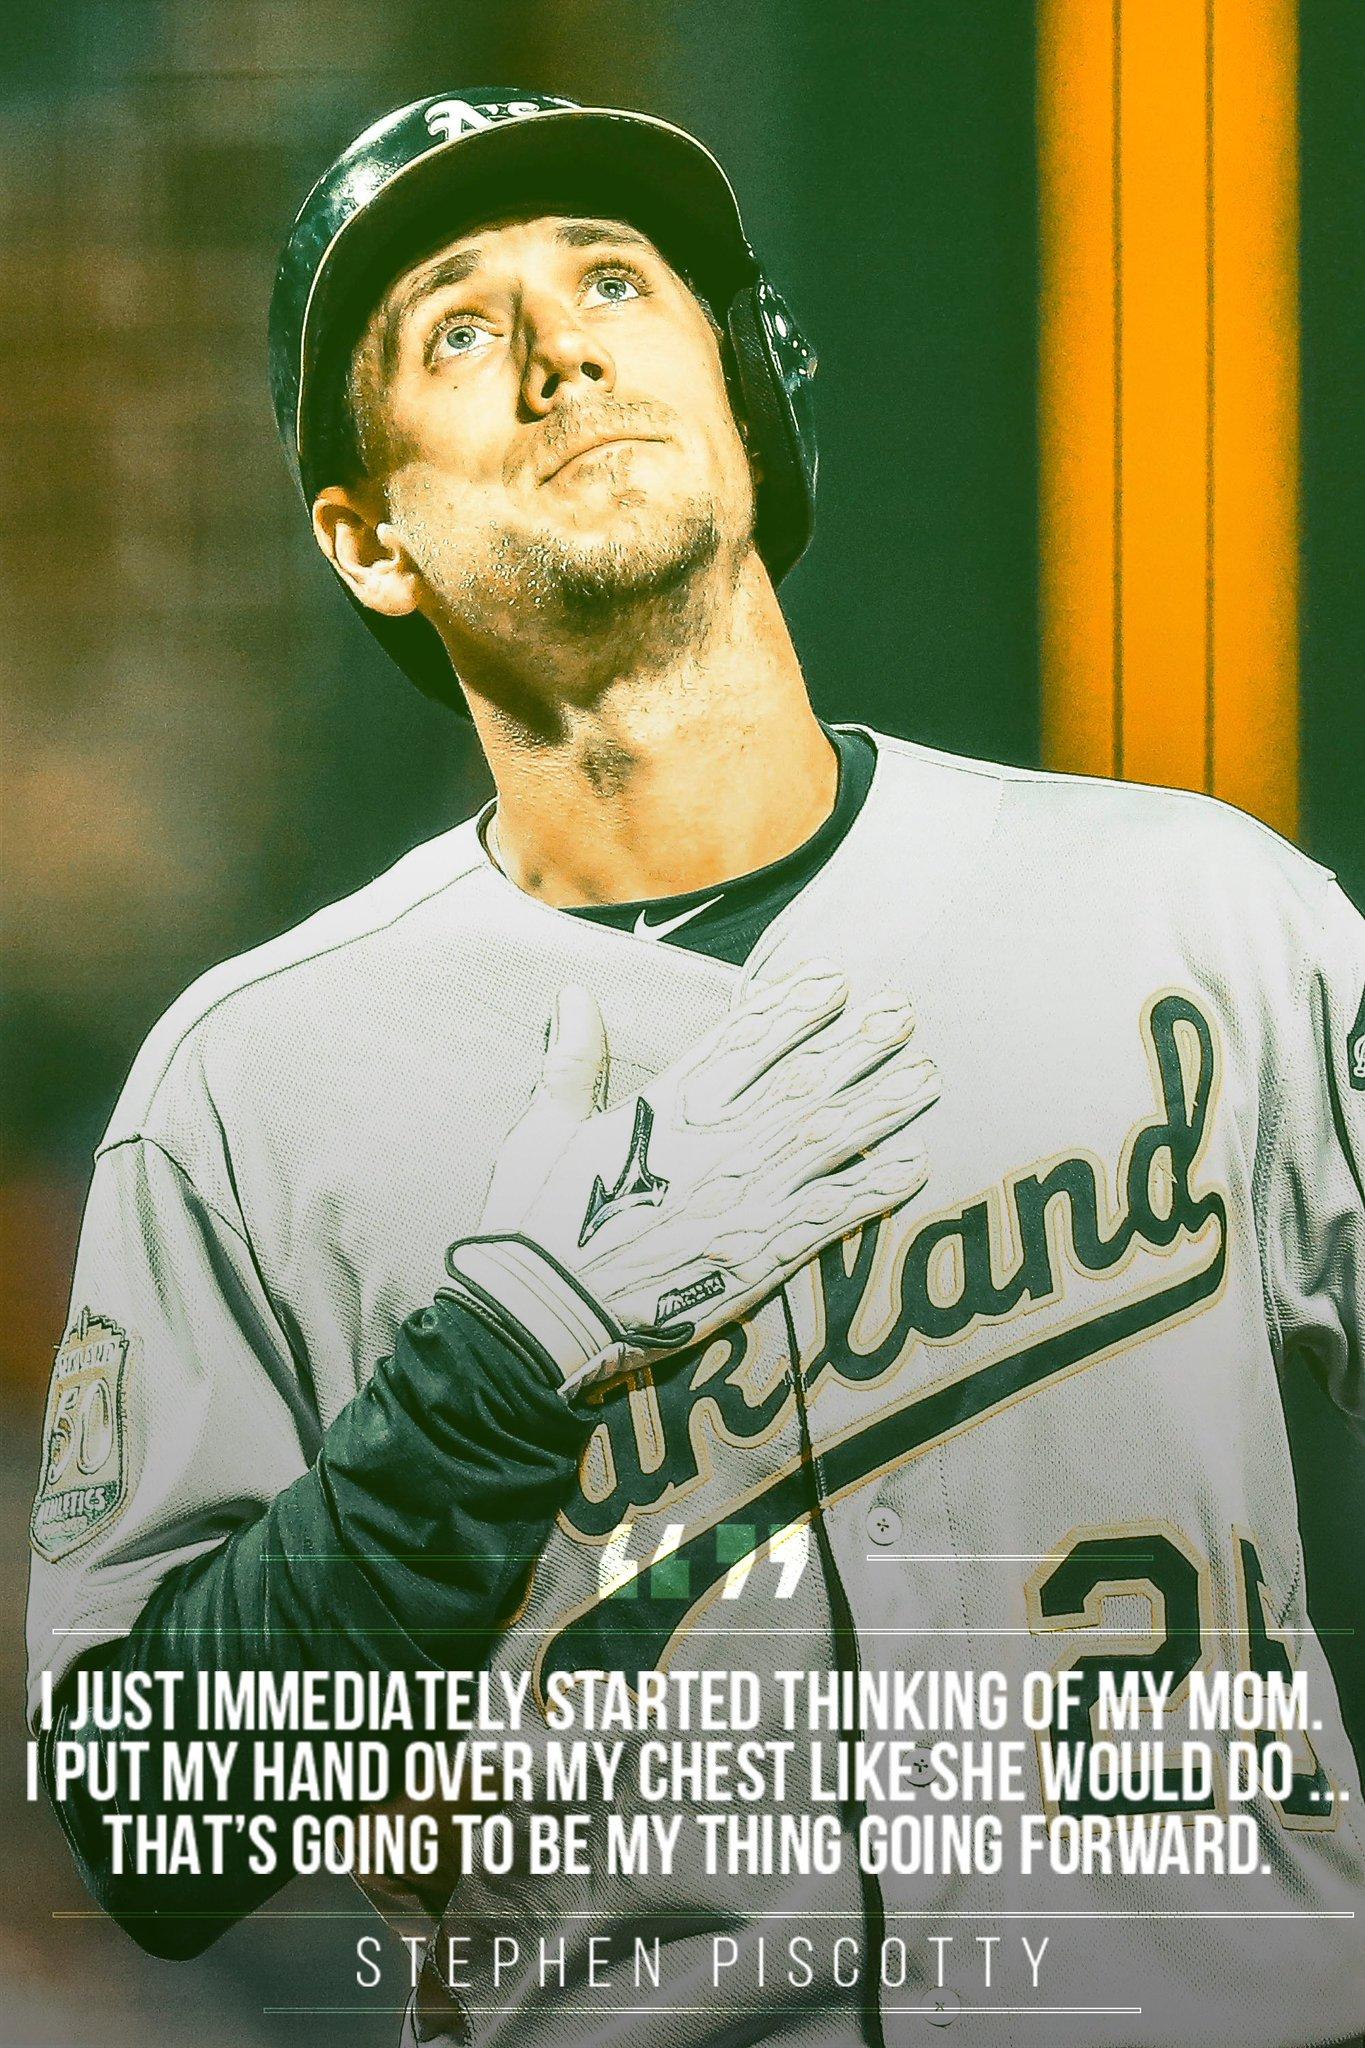 Bigger than baseball. https://t.co/8UGQfgUe7G